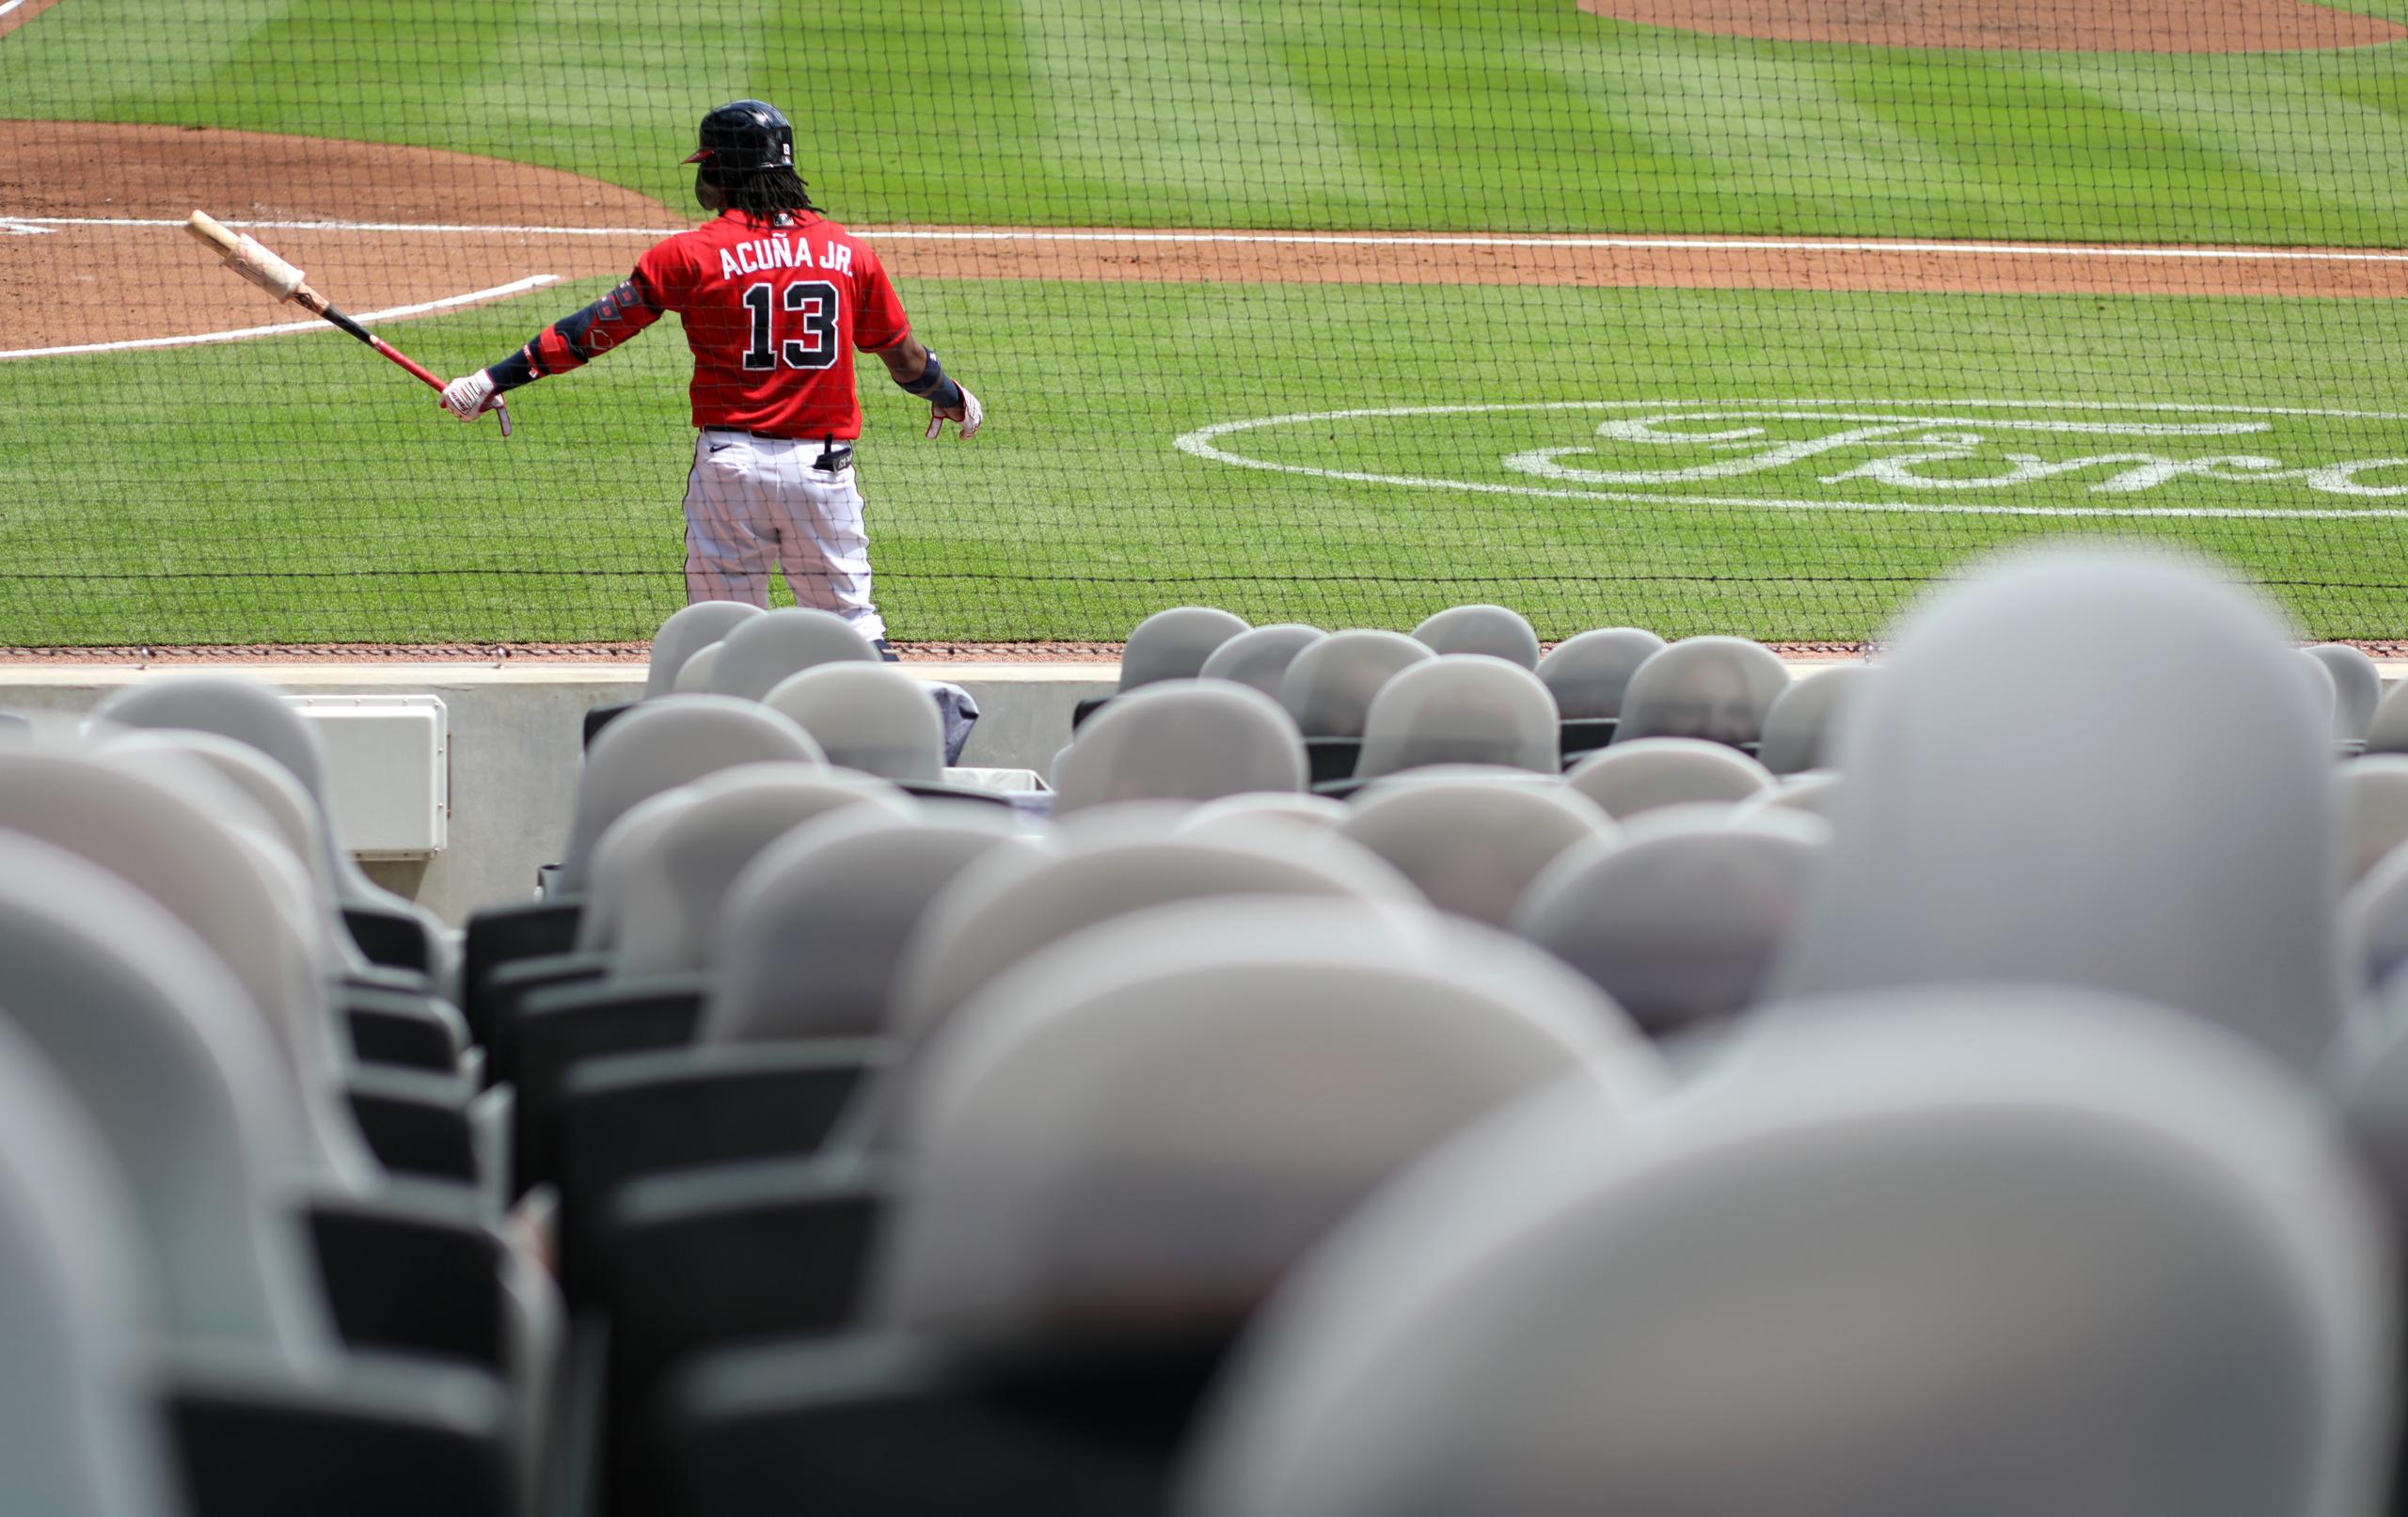 Atlanta Braves Parent Company Reports 95% Drop in Team's Q2 Revenue